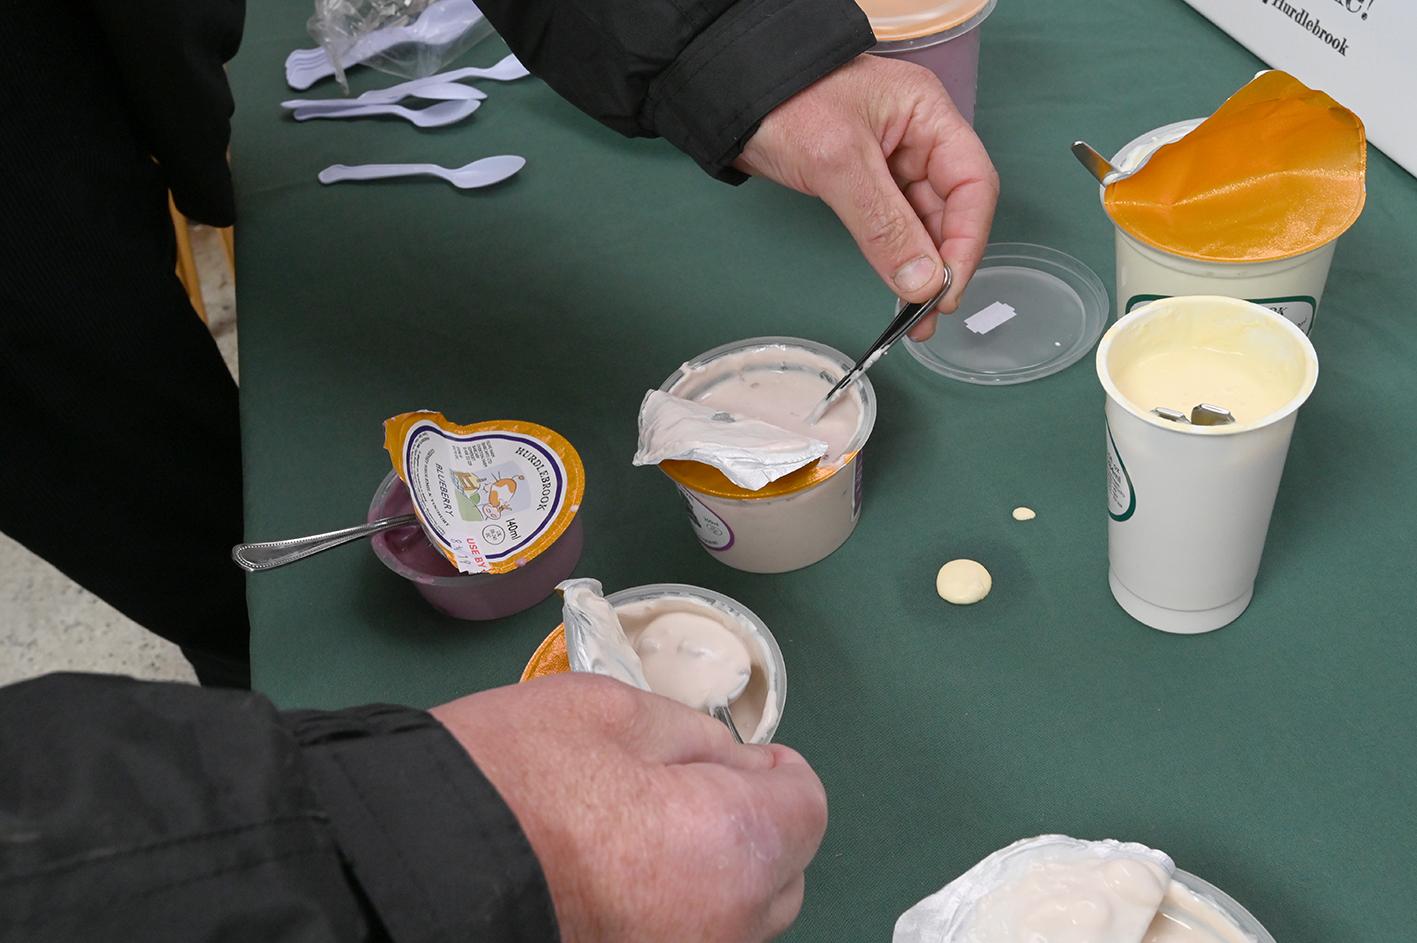 Yogurt sampling